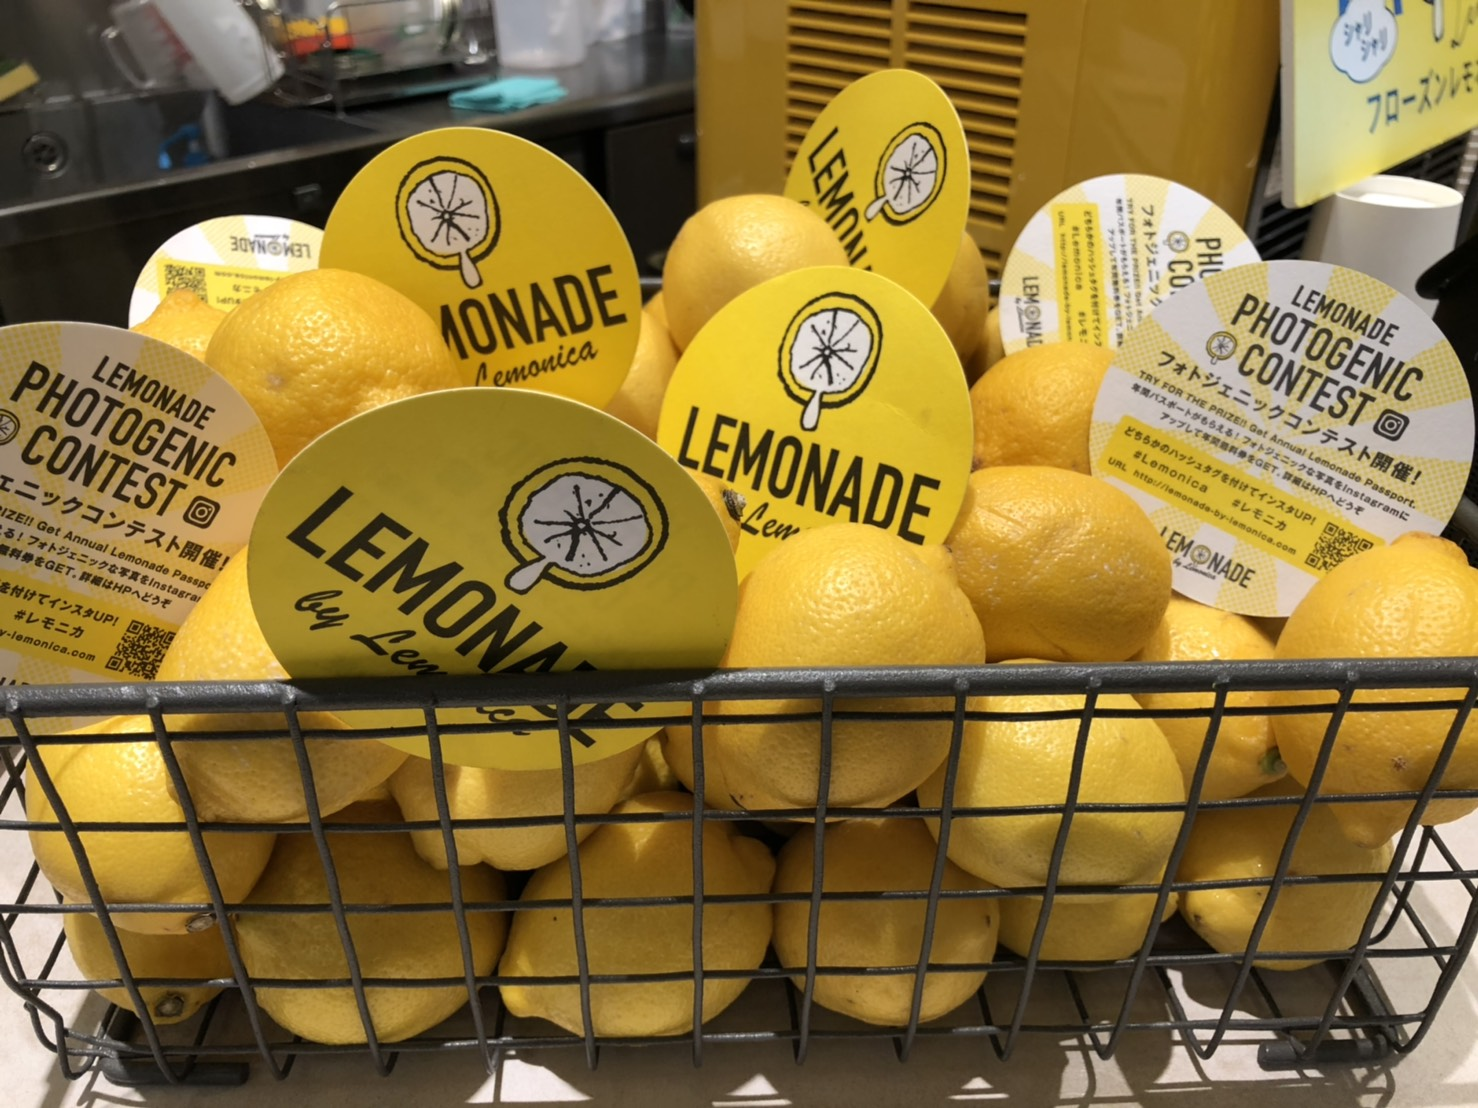 LEMONADE by Lemonica(レモネード バイ レモニカ) 丸の内店